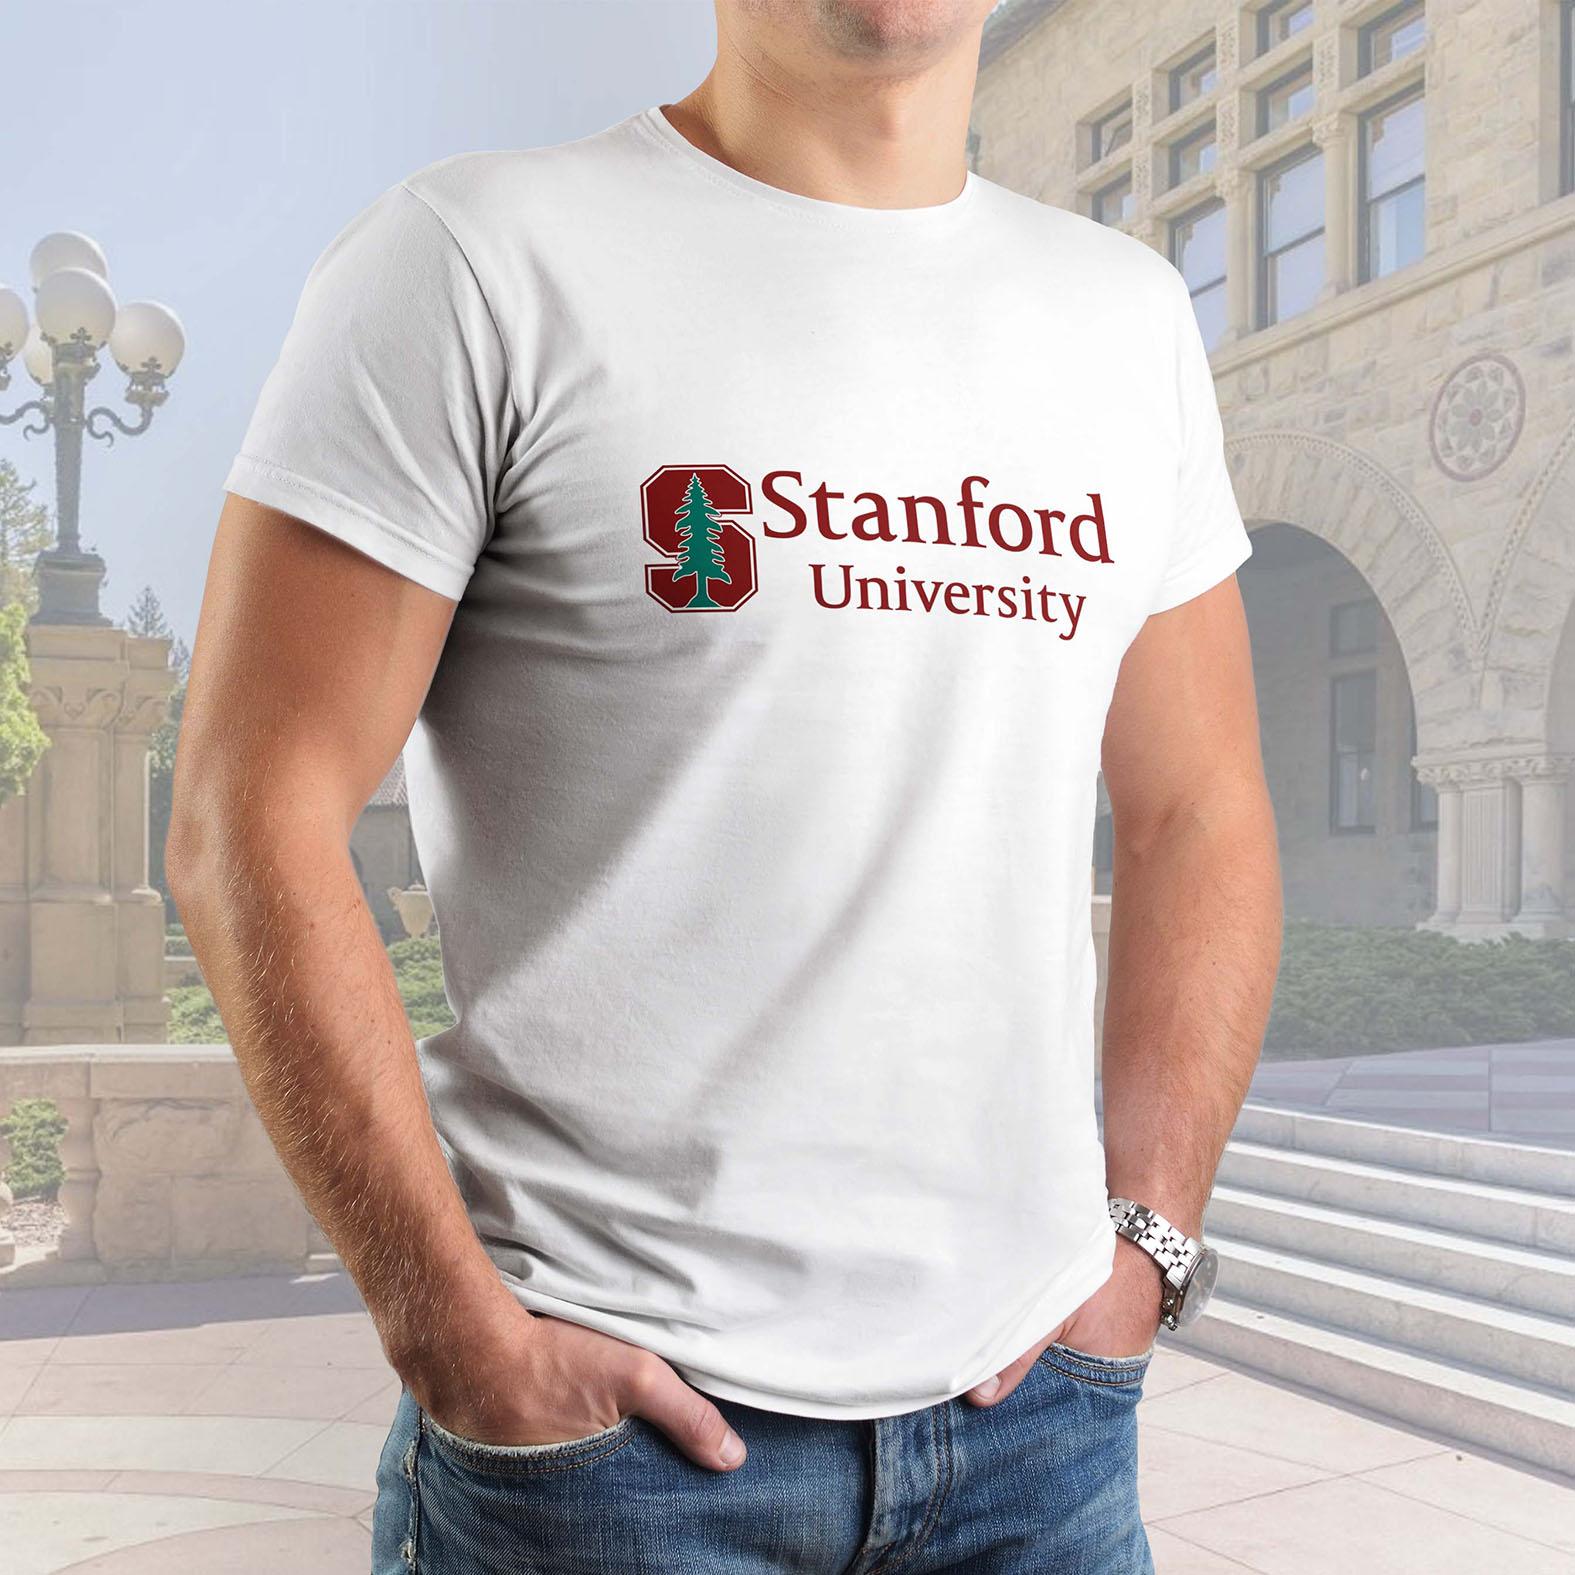 Camiseta Masculina Unissex Universidade Stanford Palo Alto Califórnia Estados Unidos University (Branca) - EV